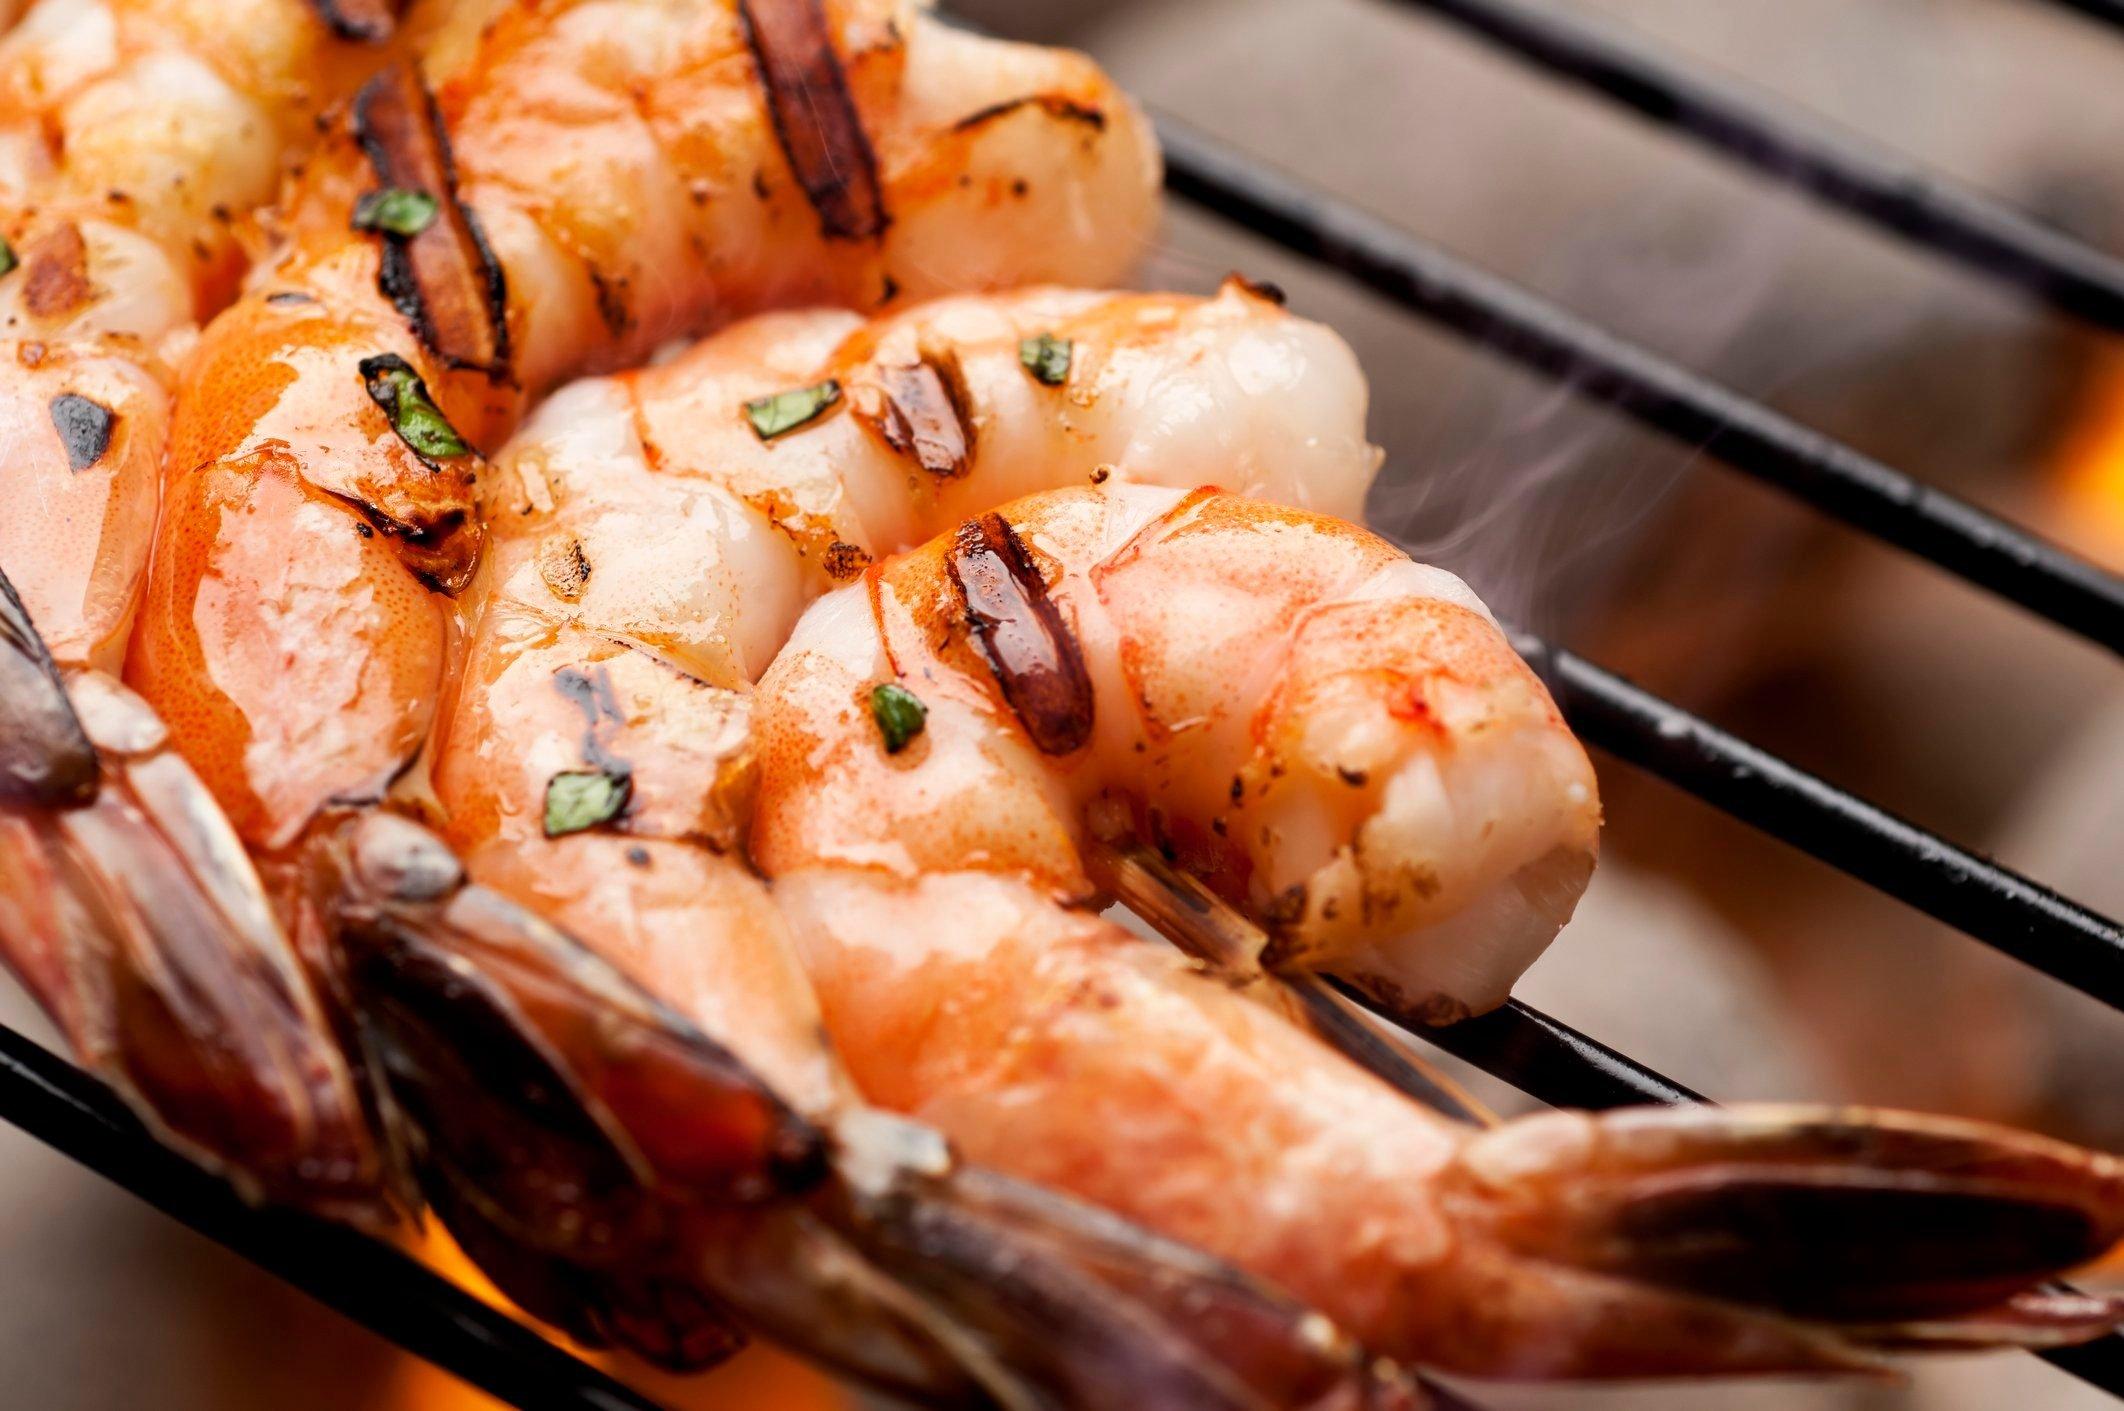 healthier grilling ideas | Grilled Shrimp